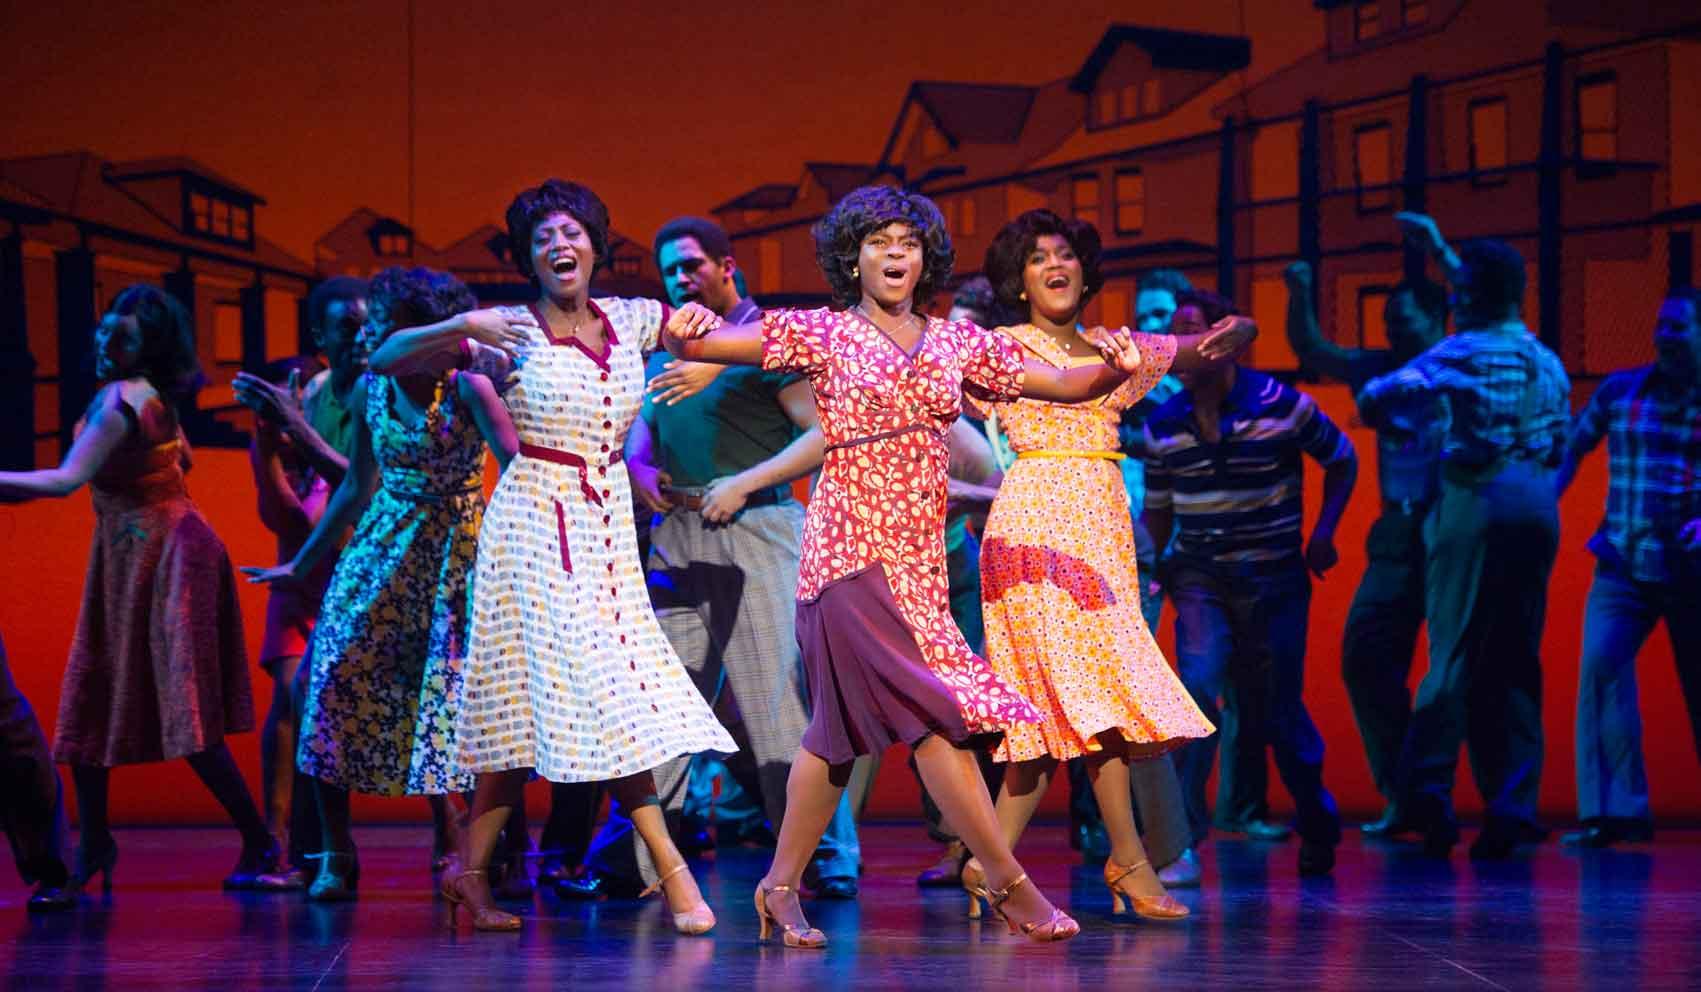 l-r Keisha Amponsa Banson, Aisha Jawando, Cleopatra Rey as Martha Reeves and the Vandellas in Motown the Musical. Photo: Alastair Muir | First Look: Motown the Musical